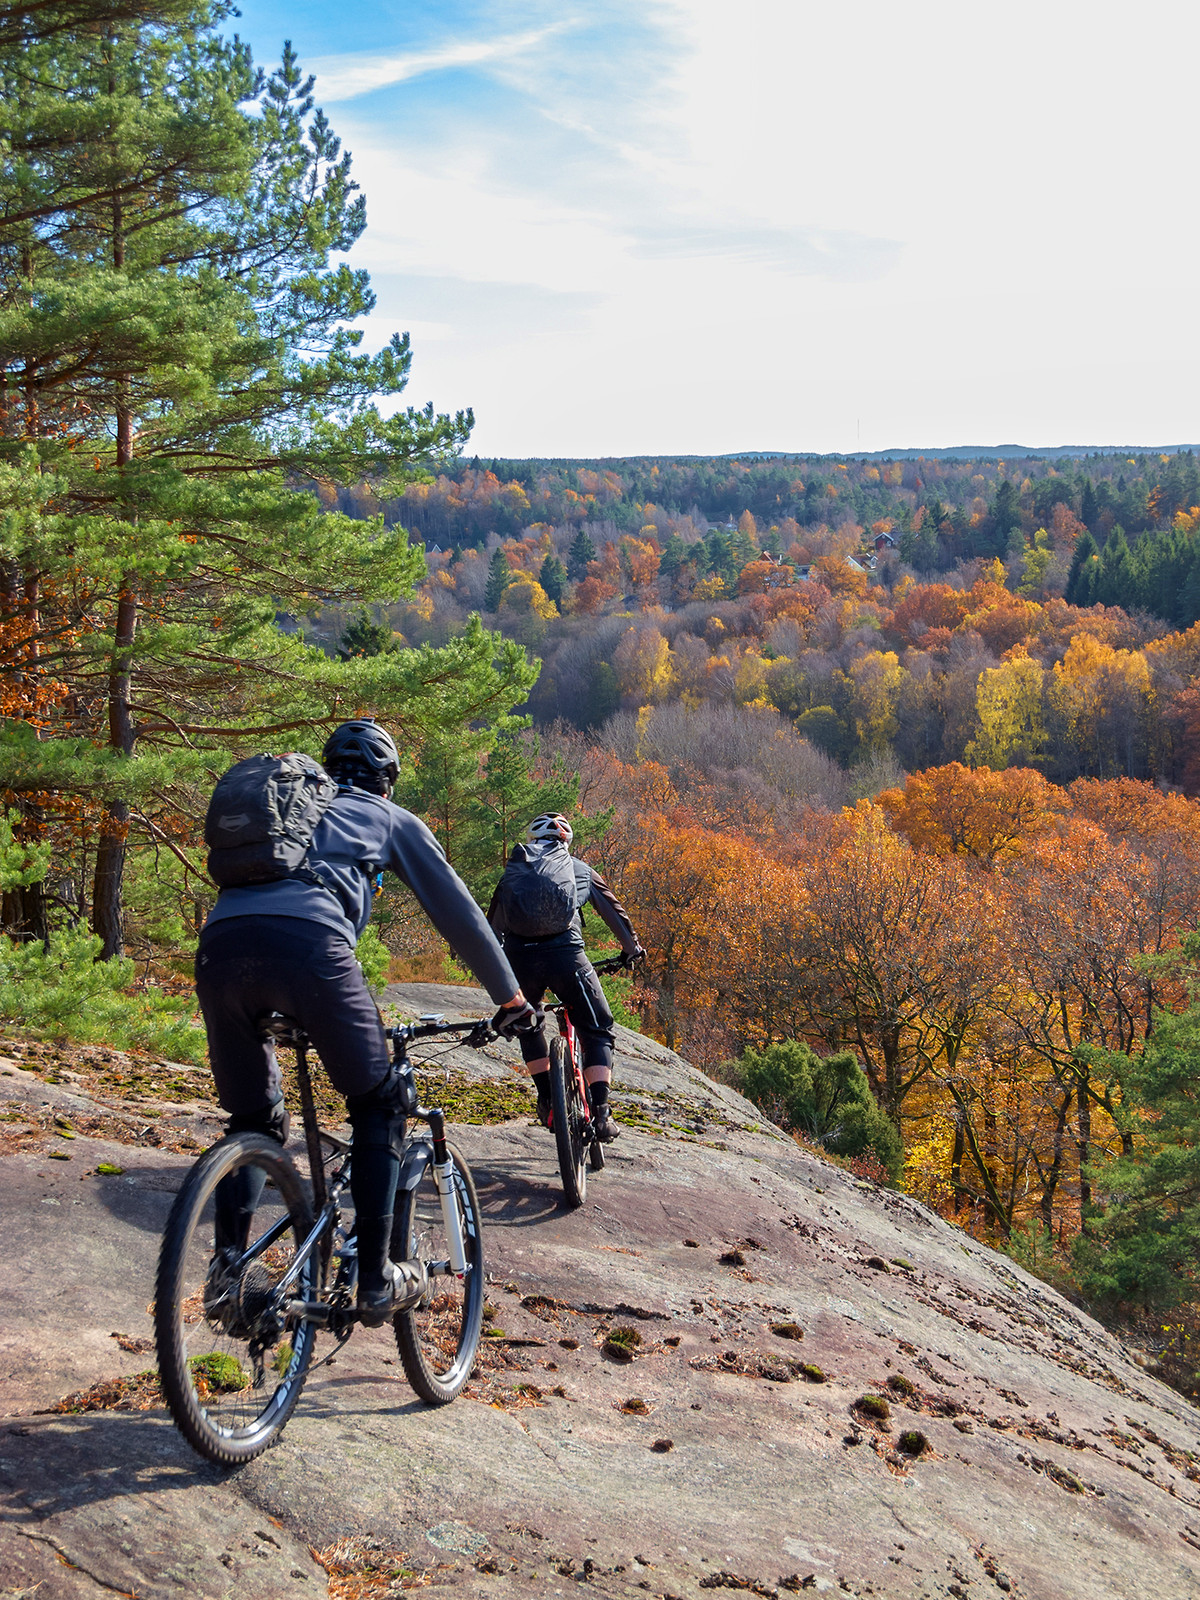 Hillside Trail - Hillside Cycling - Mountain Biking Pictures - Vital MTB